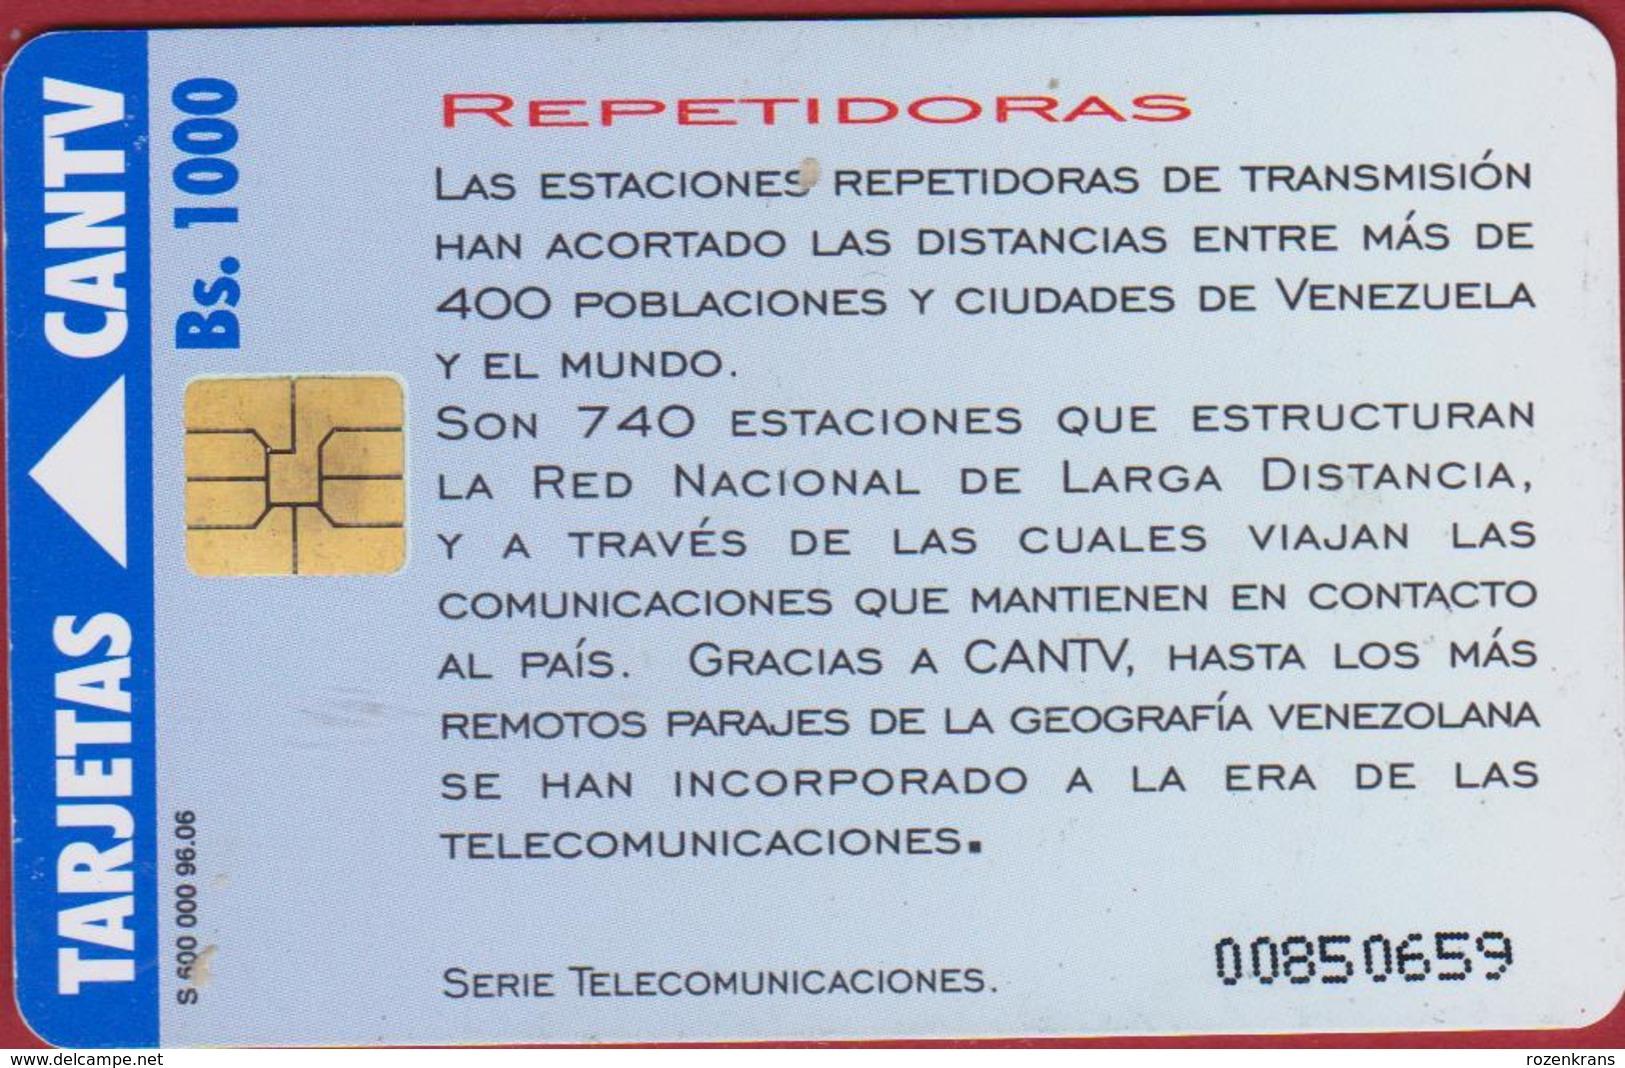 Venezuela REPETIDORAS Telecom CANTV  Telefoonkaart Telecarte PHONECARD Tarjeta Telecard TELEFONKARTE - Telekom-Betreiber